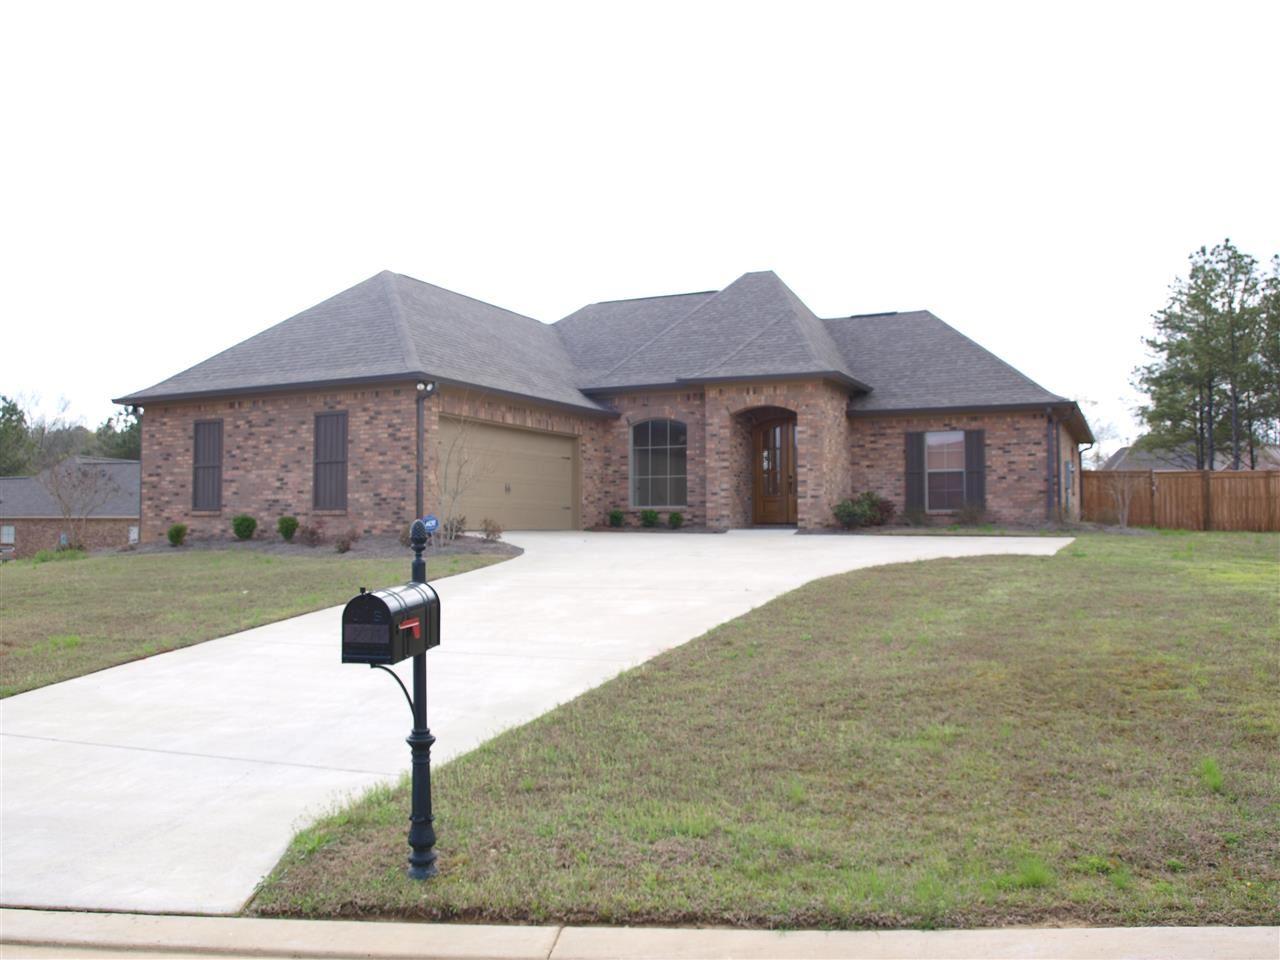 Rental Homes for Rent, ListingId:32397581, location: 201 HERRINGTON CV Madison 39110